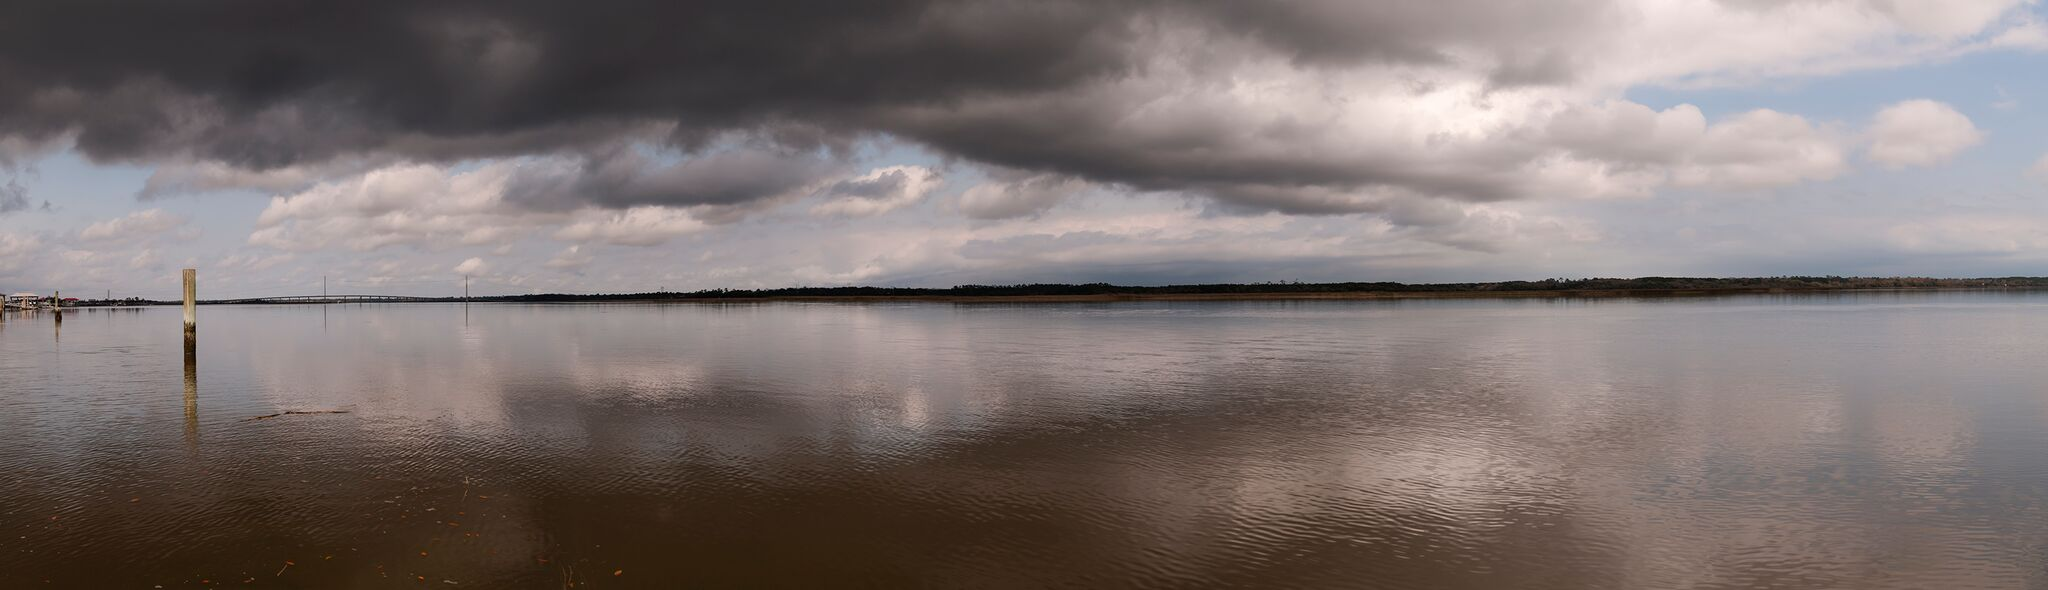 Stono River #73555